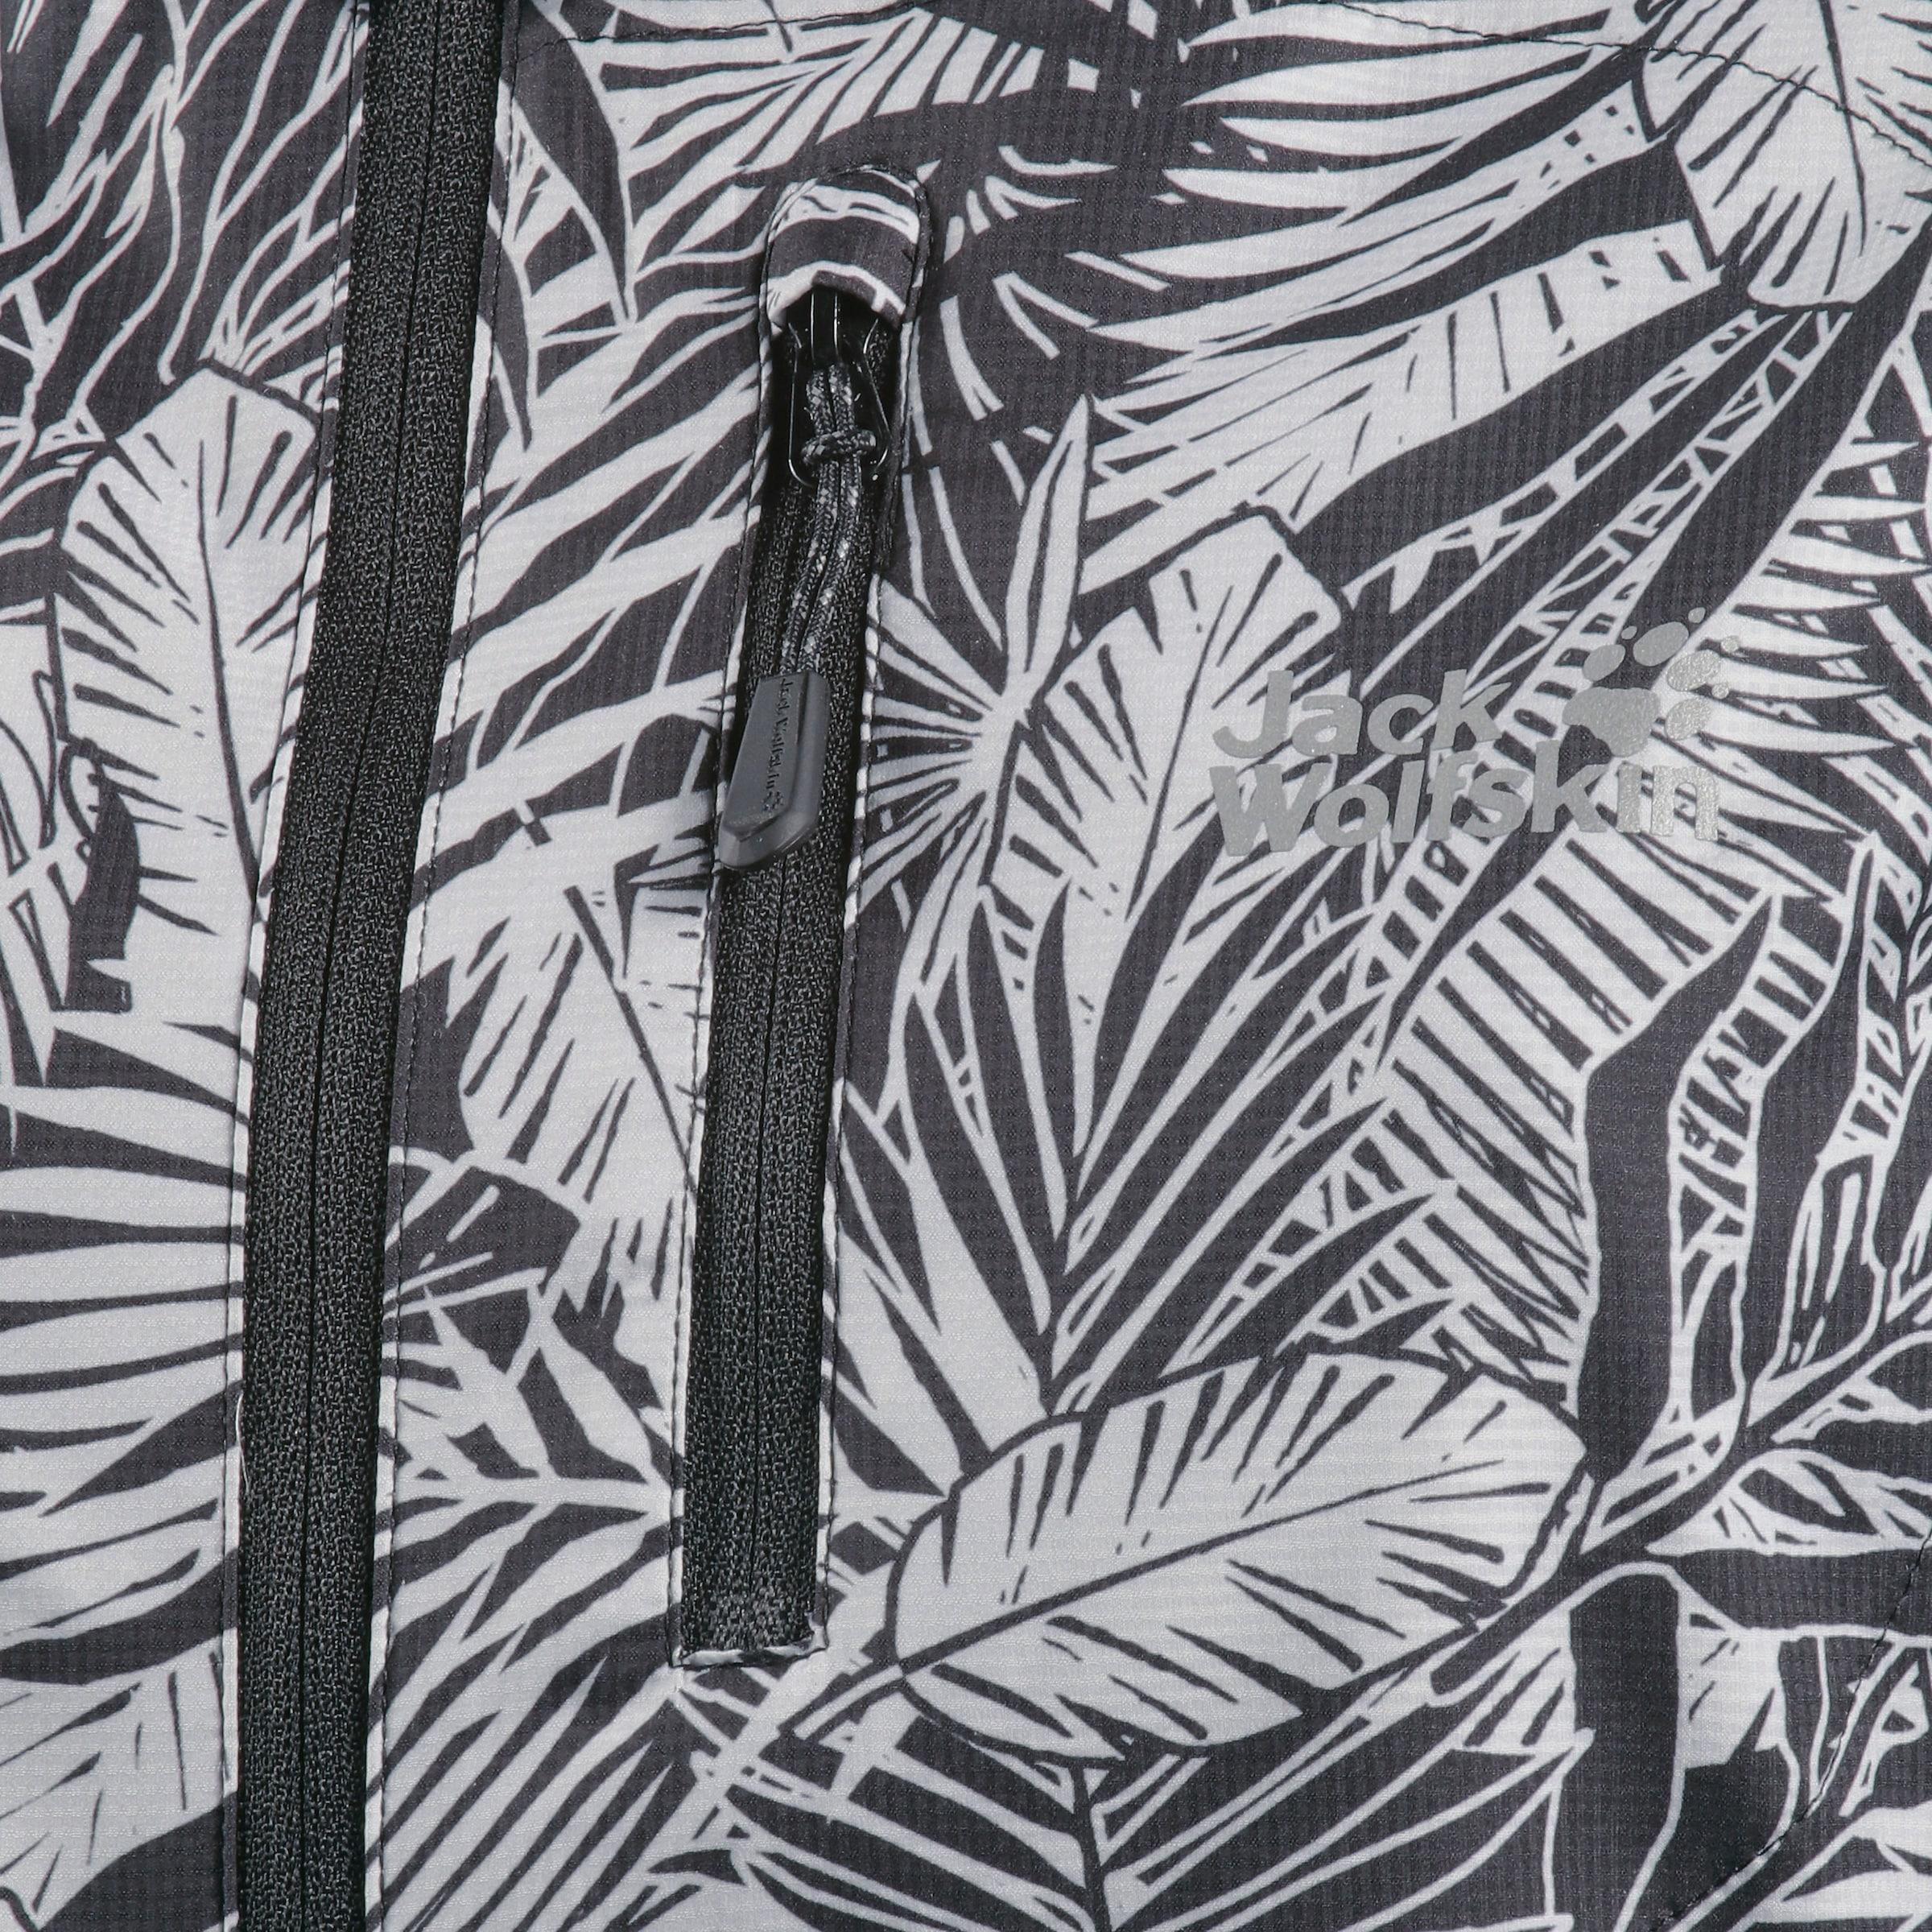 Zum Verkauf Footlocker JACK WOLFSKIN Windbreaker 'Flyweight Jungle' Perfekte Online 5A6RPfQEO